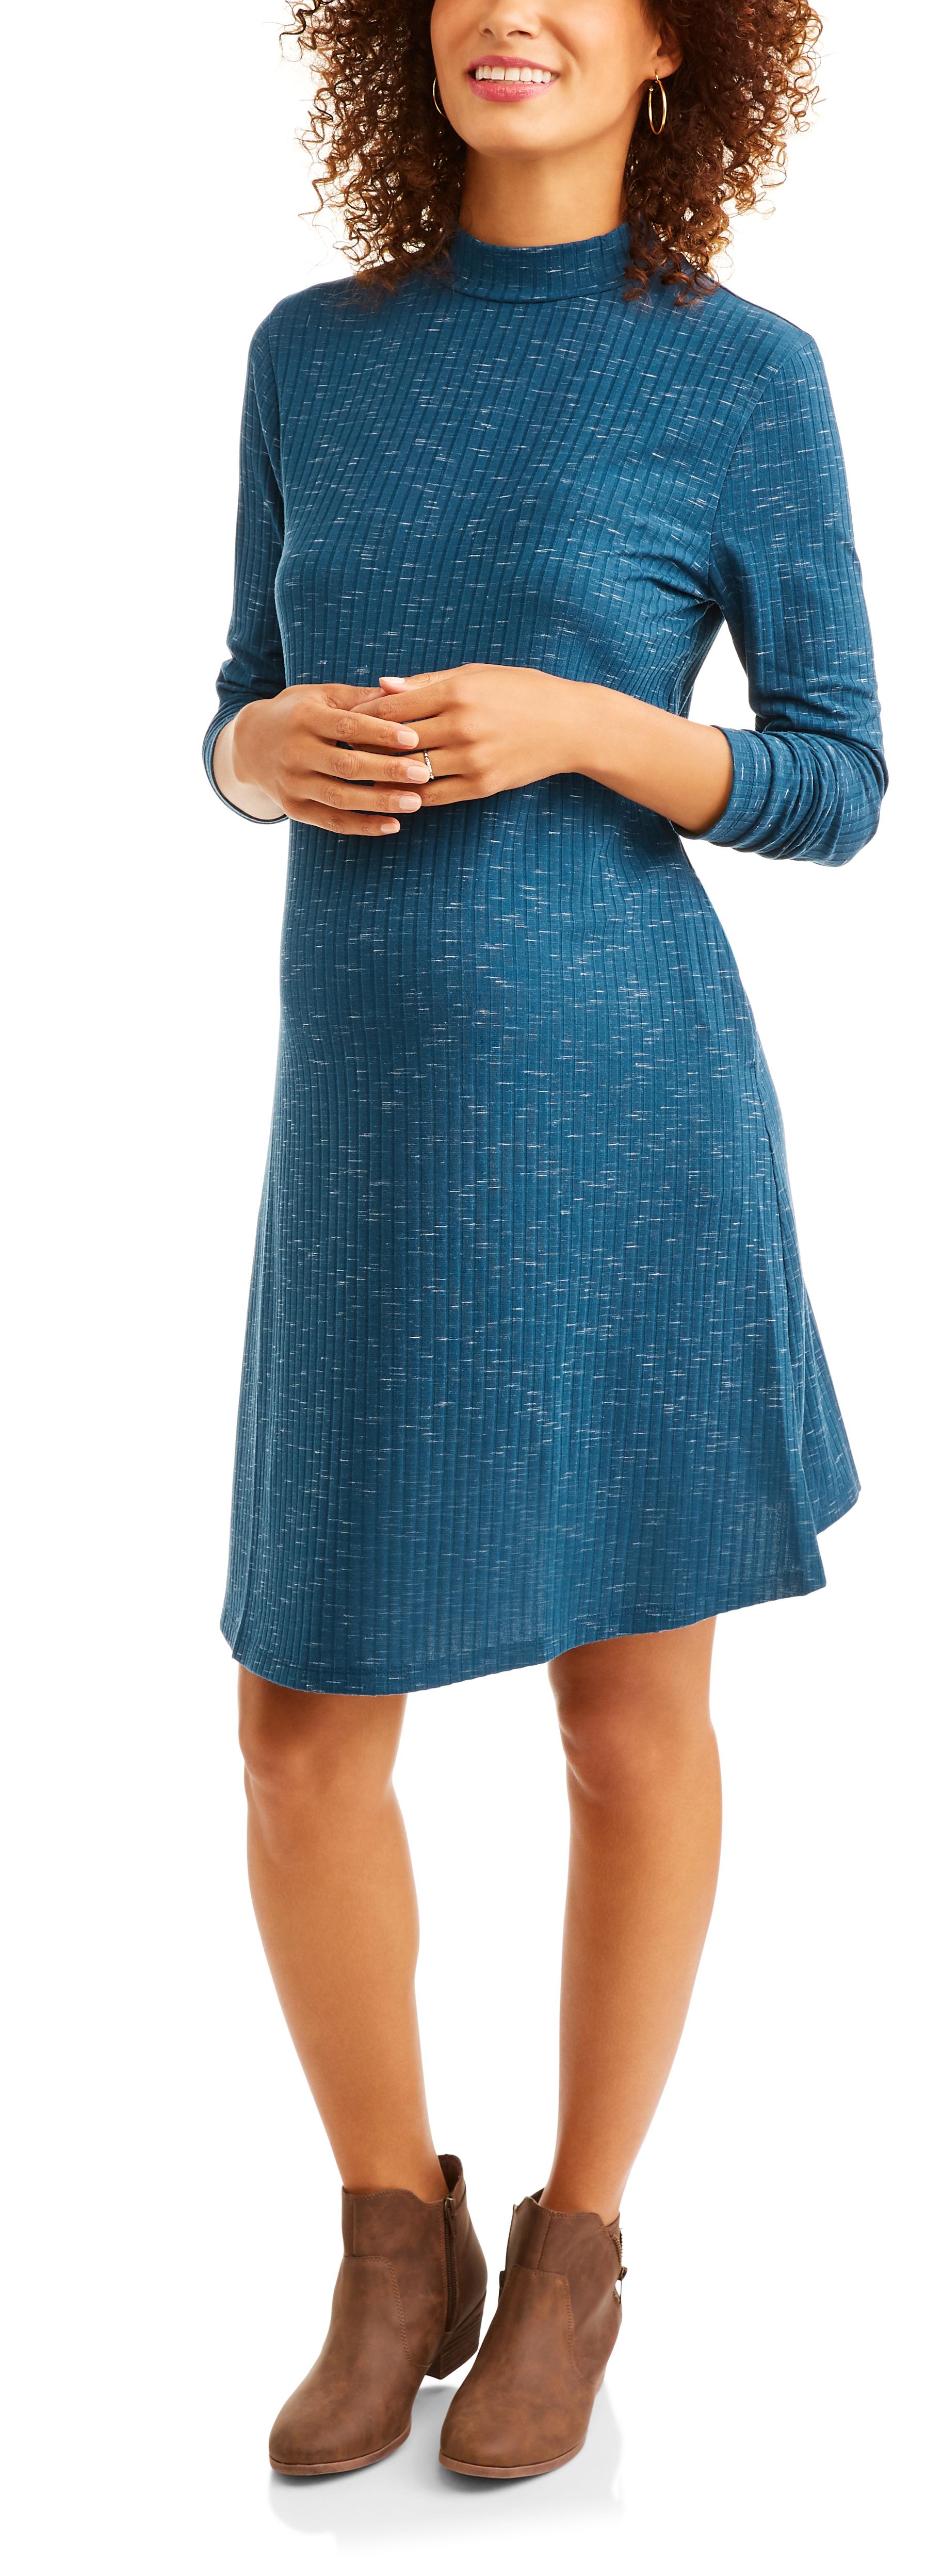 Faded Glory Maternity Long Sleeve Mock Neck Knit Rib Swing Dress